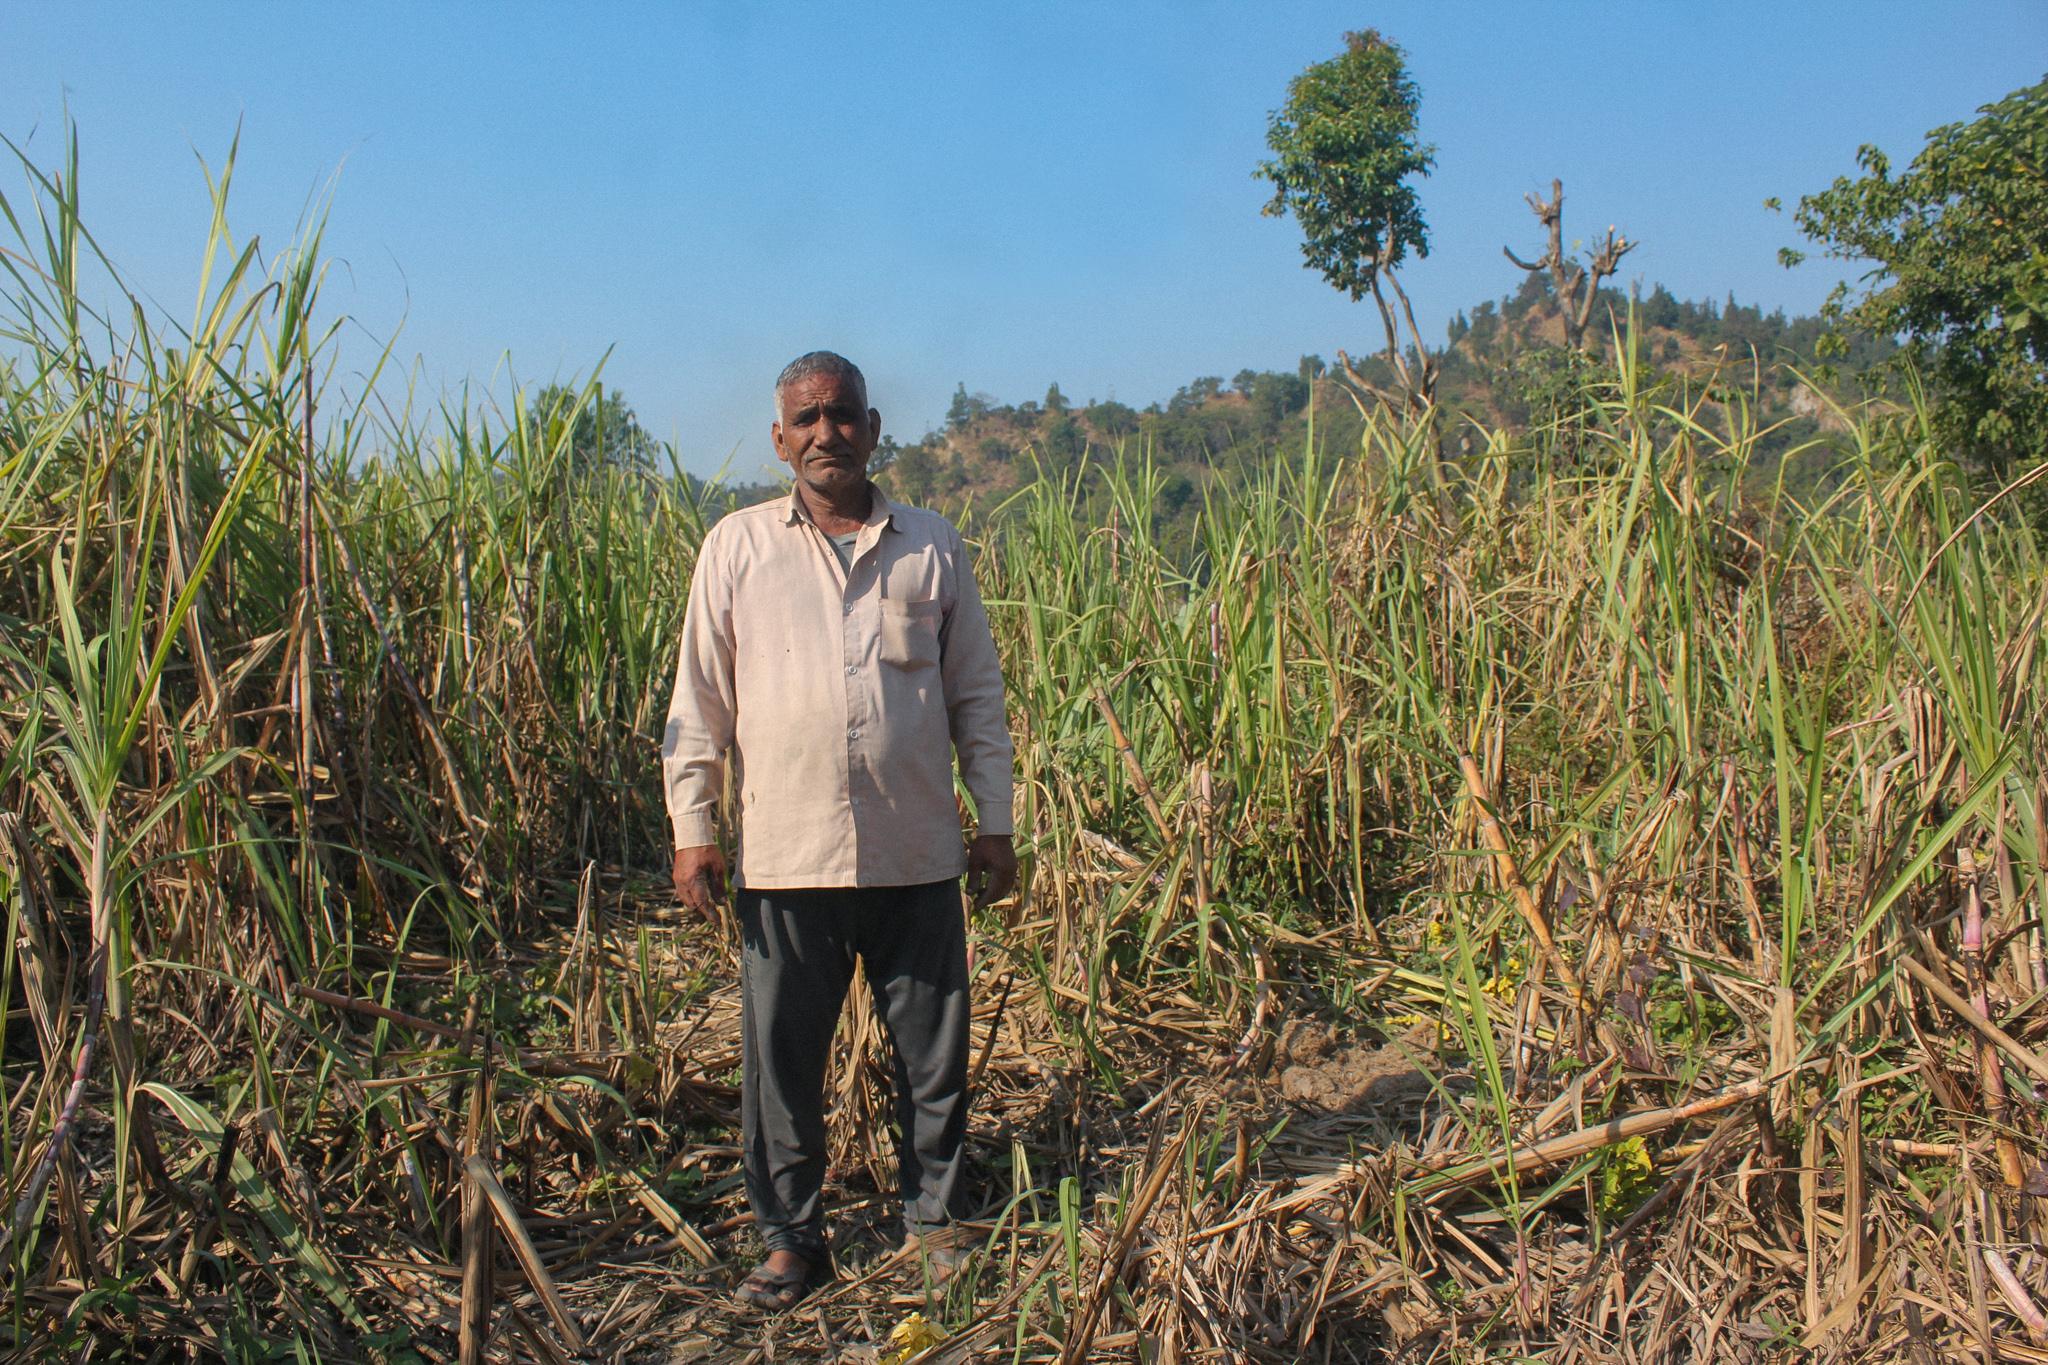 Bahuguna Jeevanan of Peeli Padav village stands between his sugarcane field destroyed by elephants. Image credit: Radhika Gupta